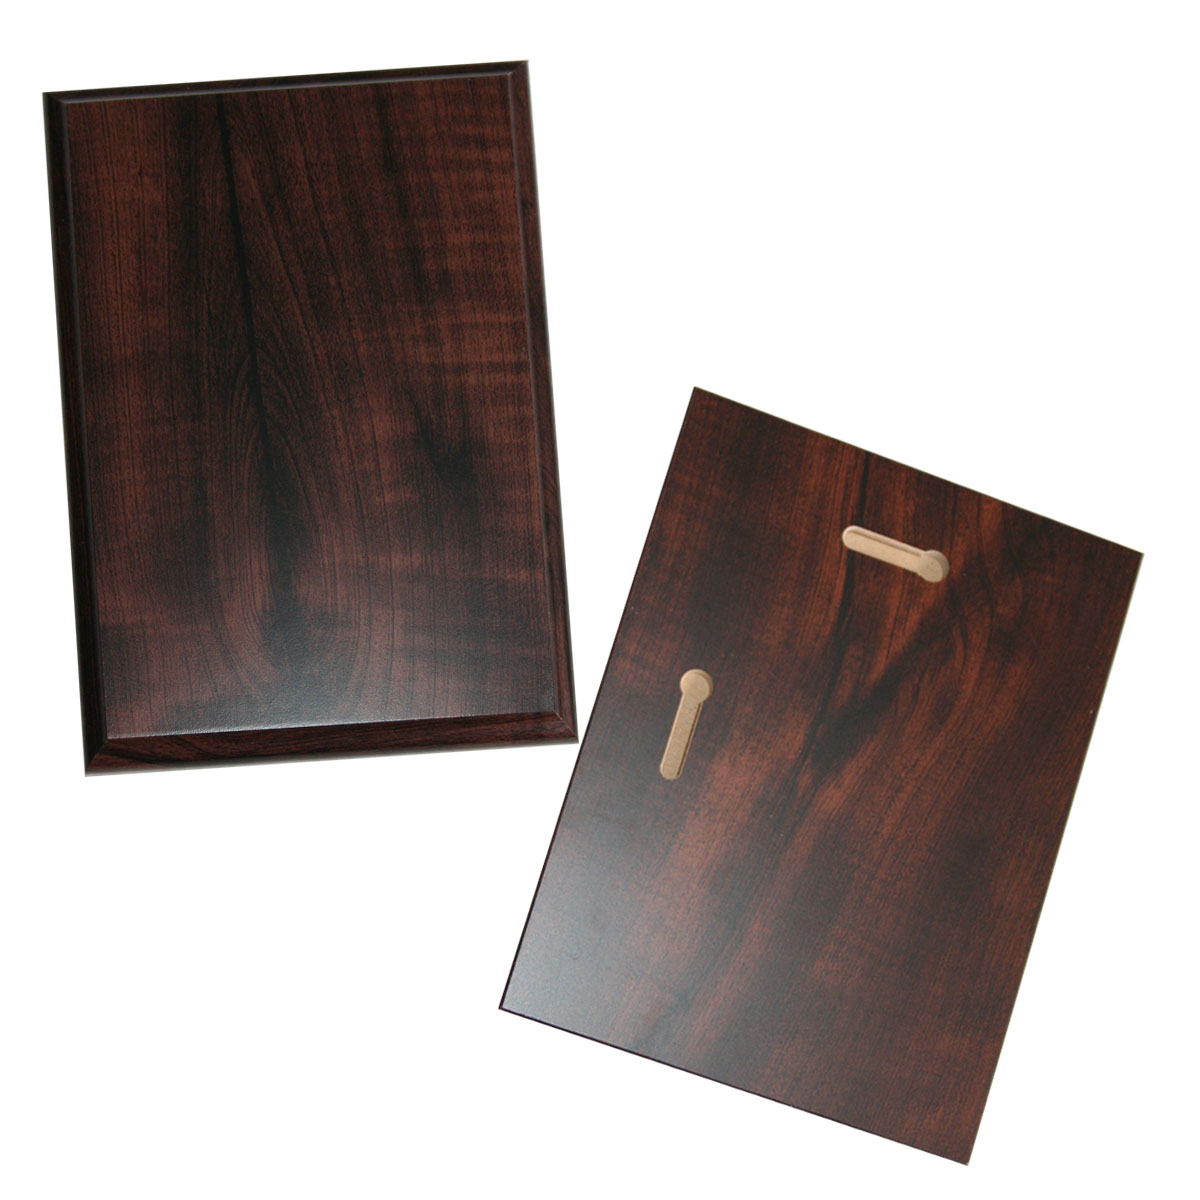 Wood base for metal for sublimation printout